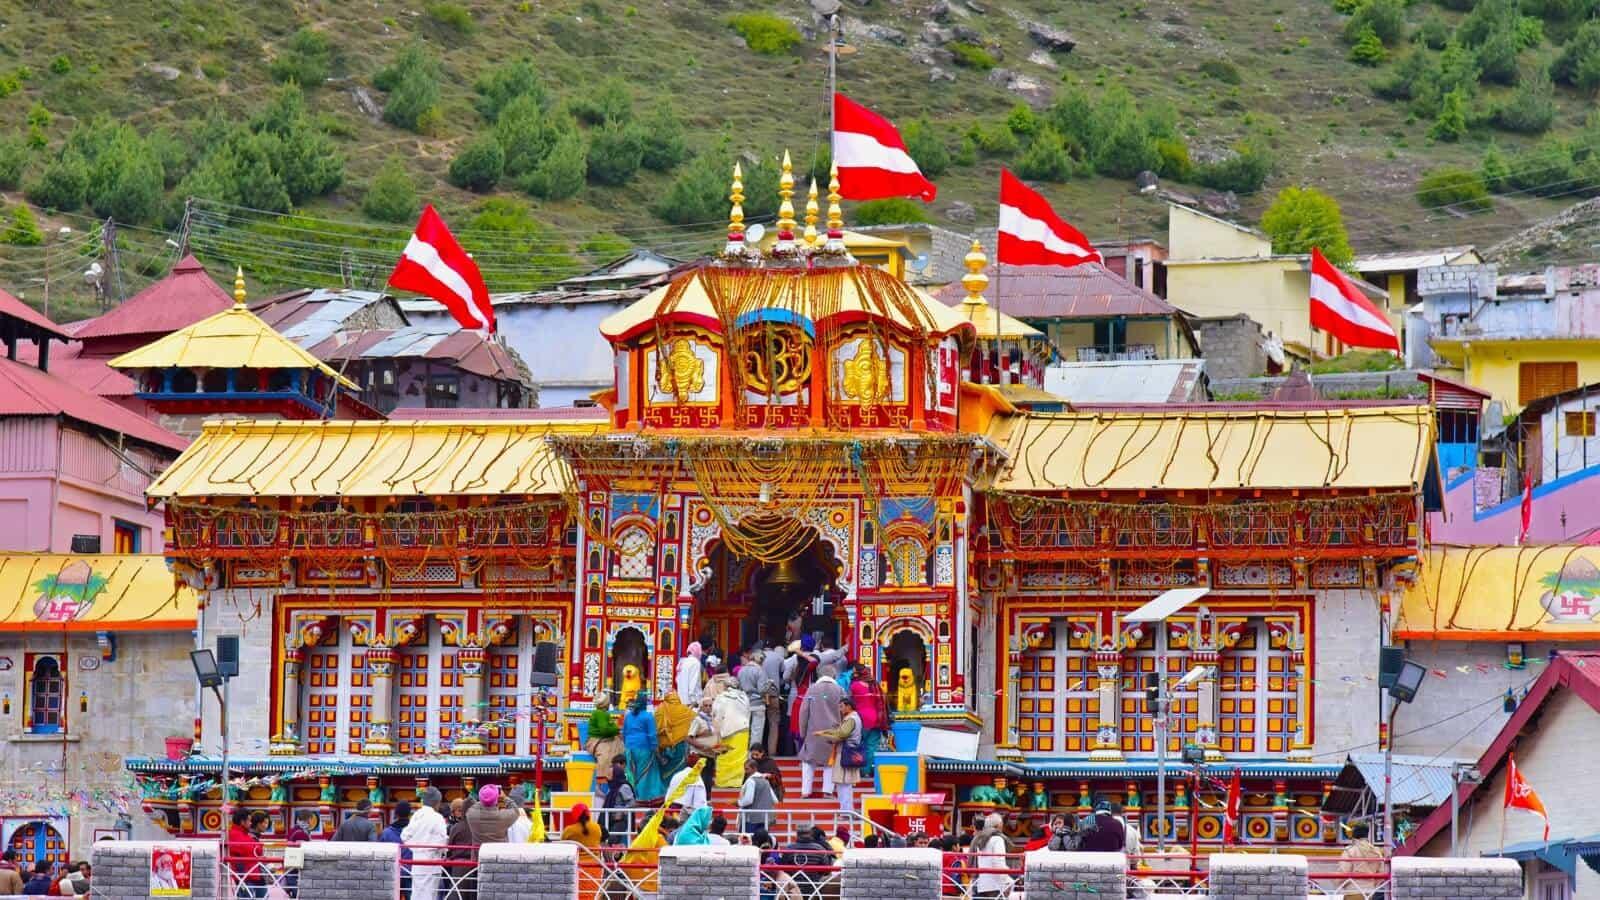 Kashi, Badrinath & Kedarnath